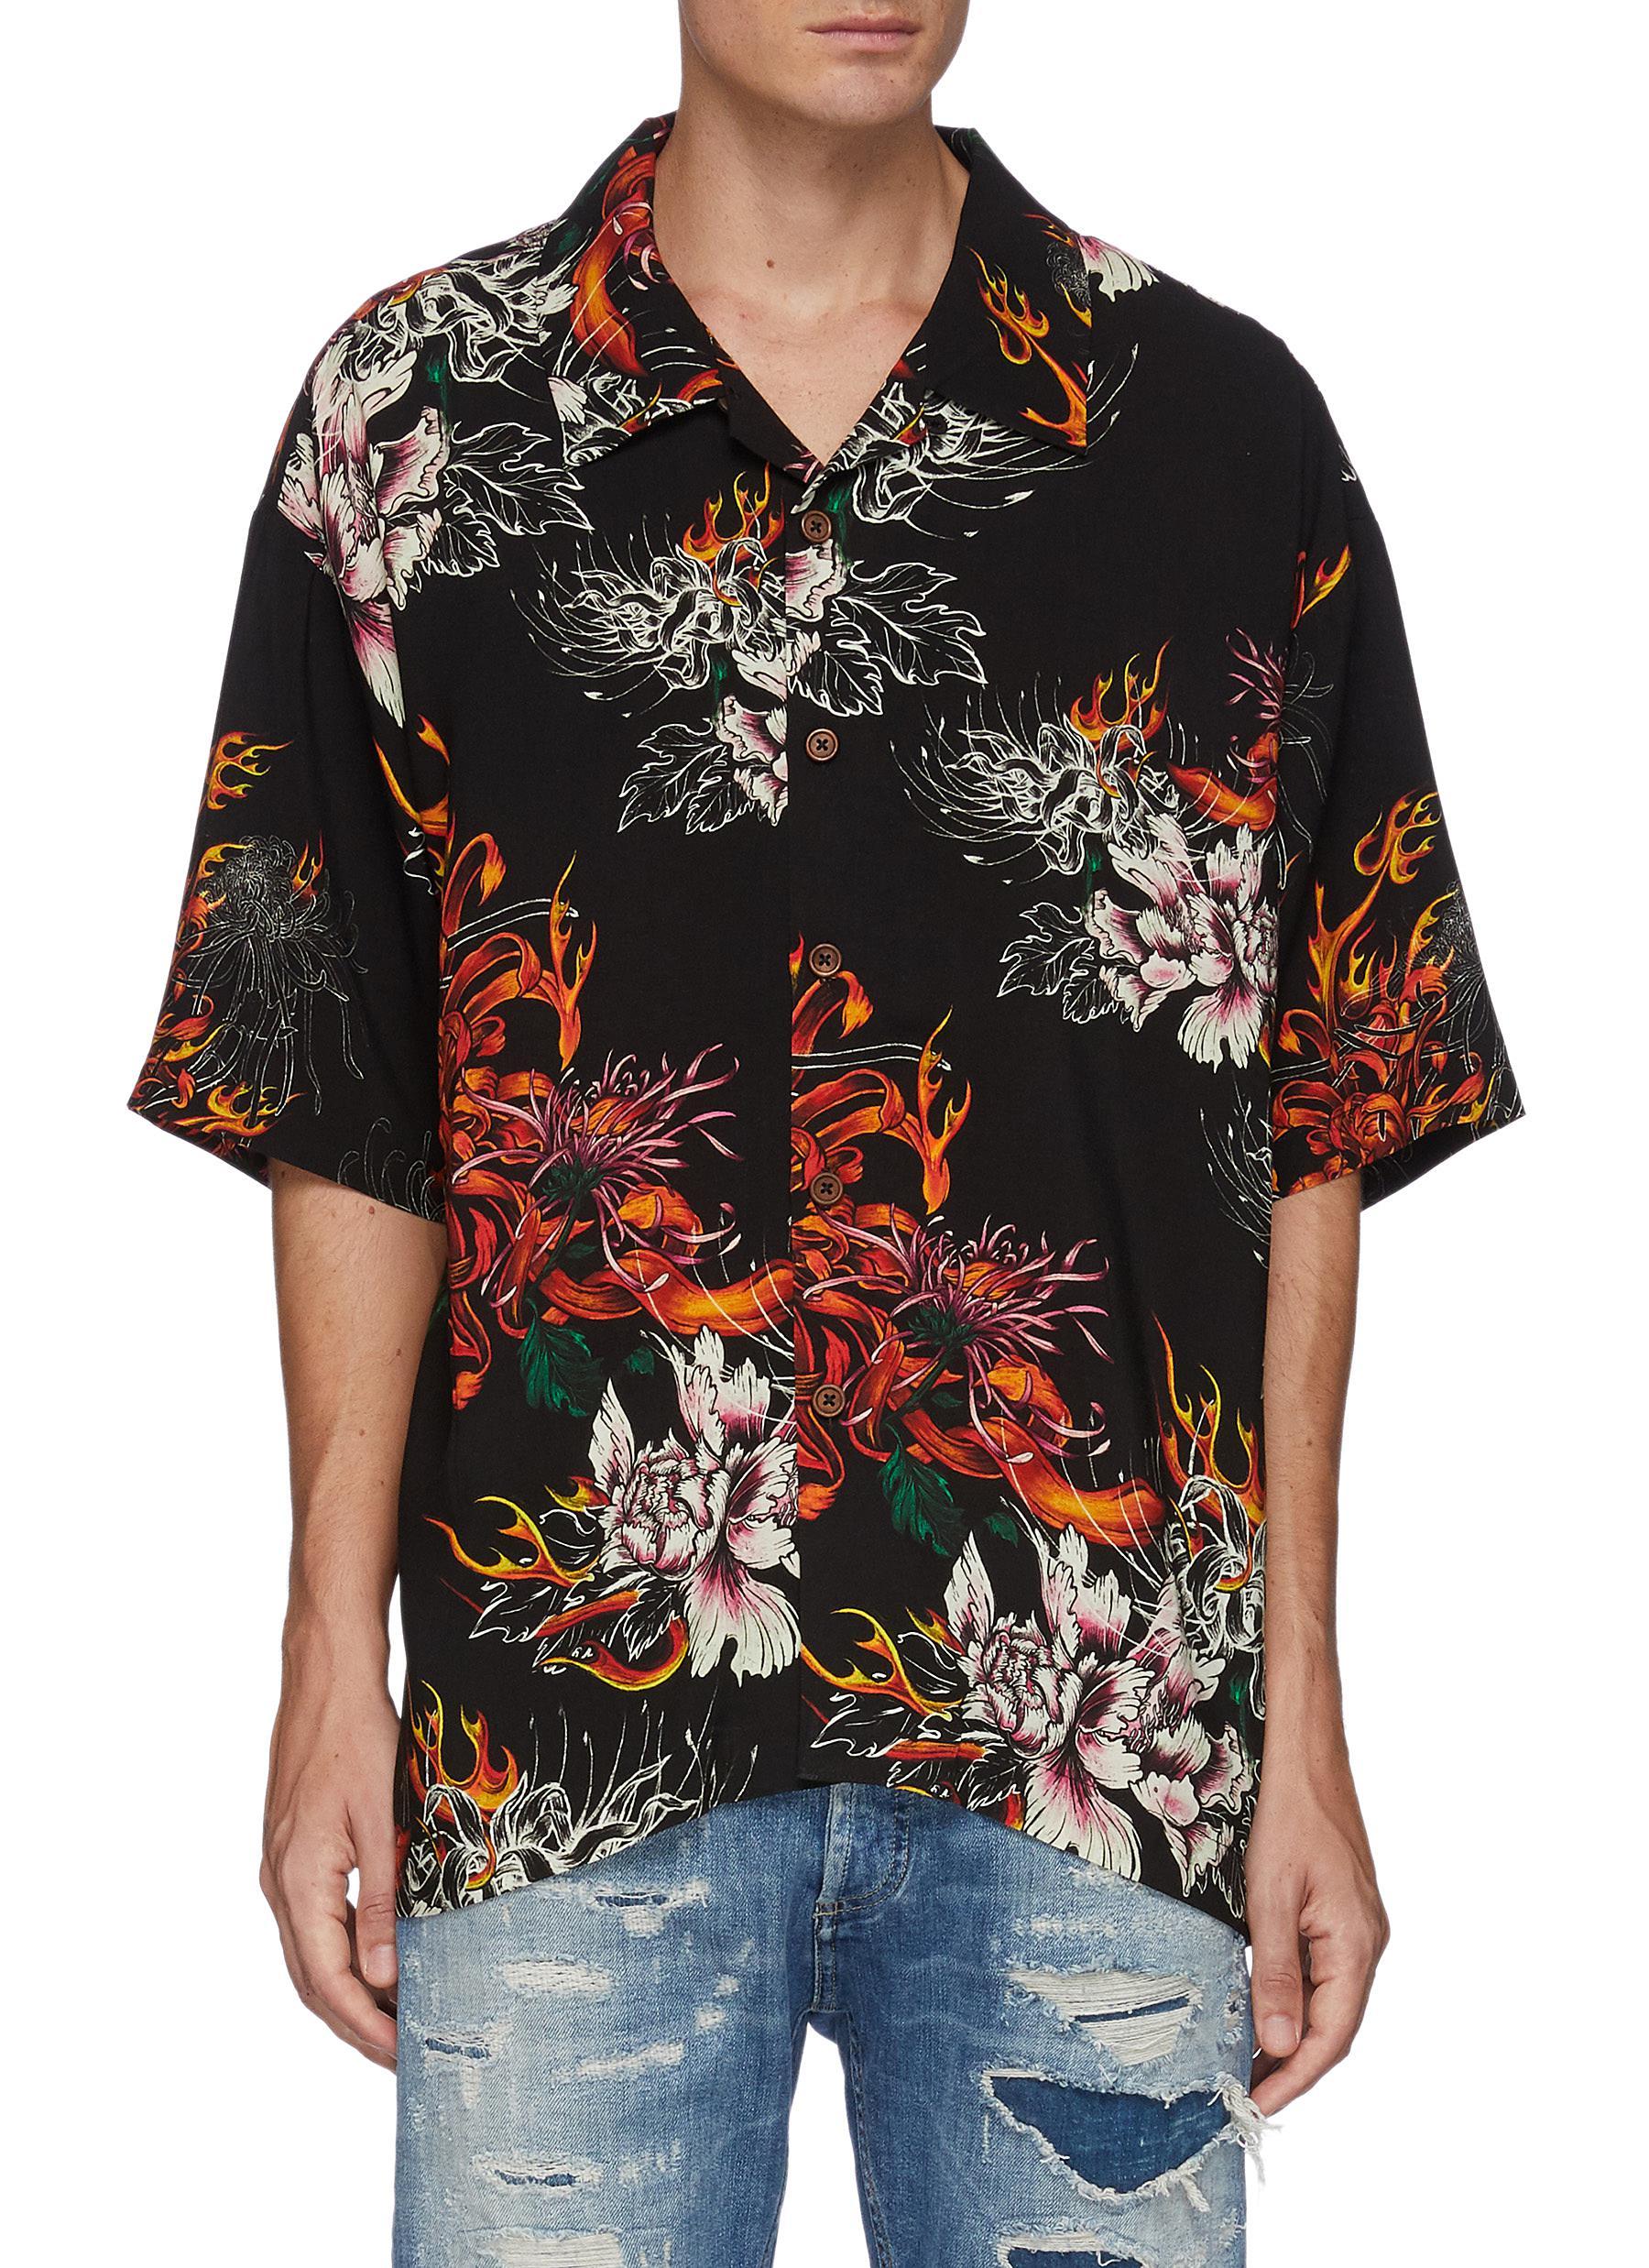 Oversized All Over Flaming Floral Print Hawaiian Shirt